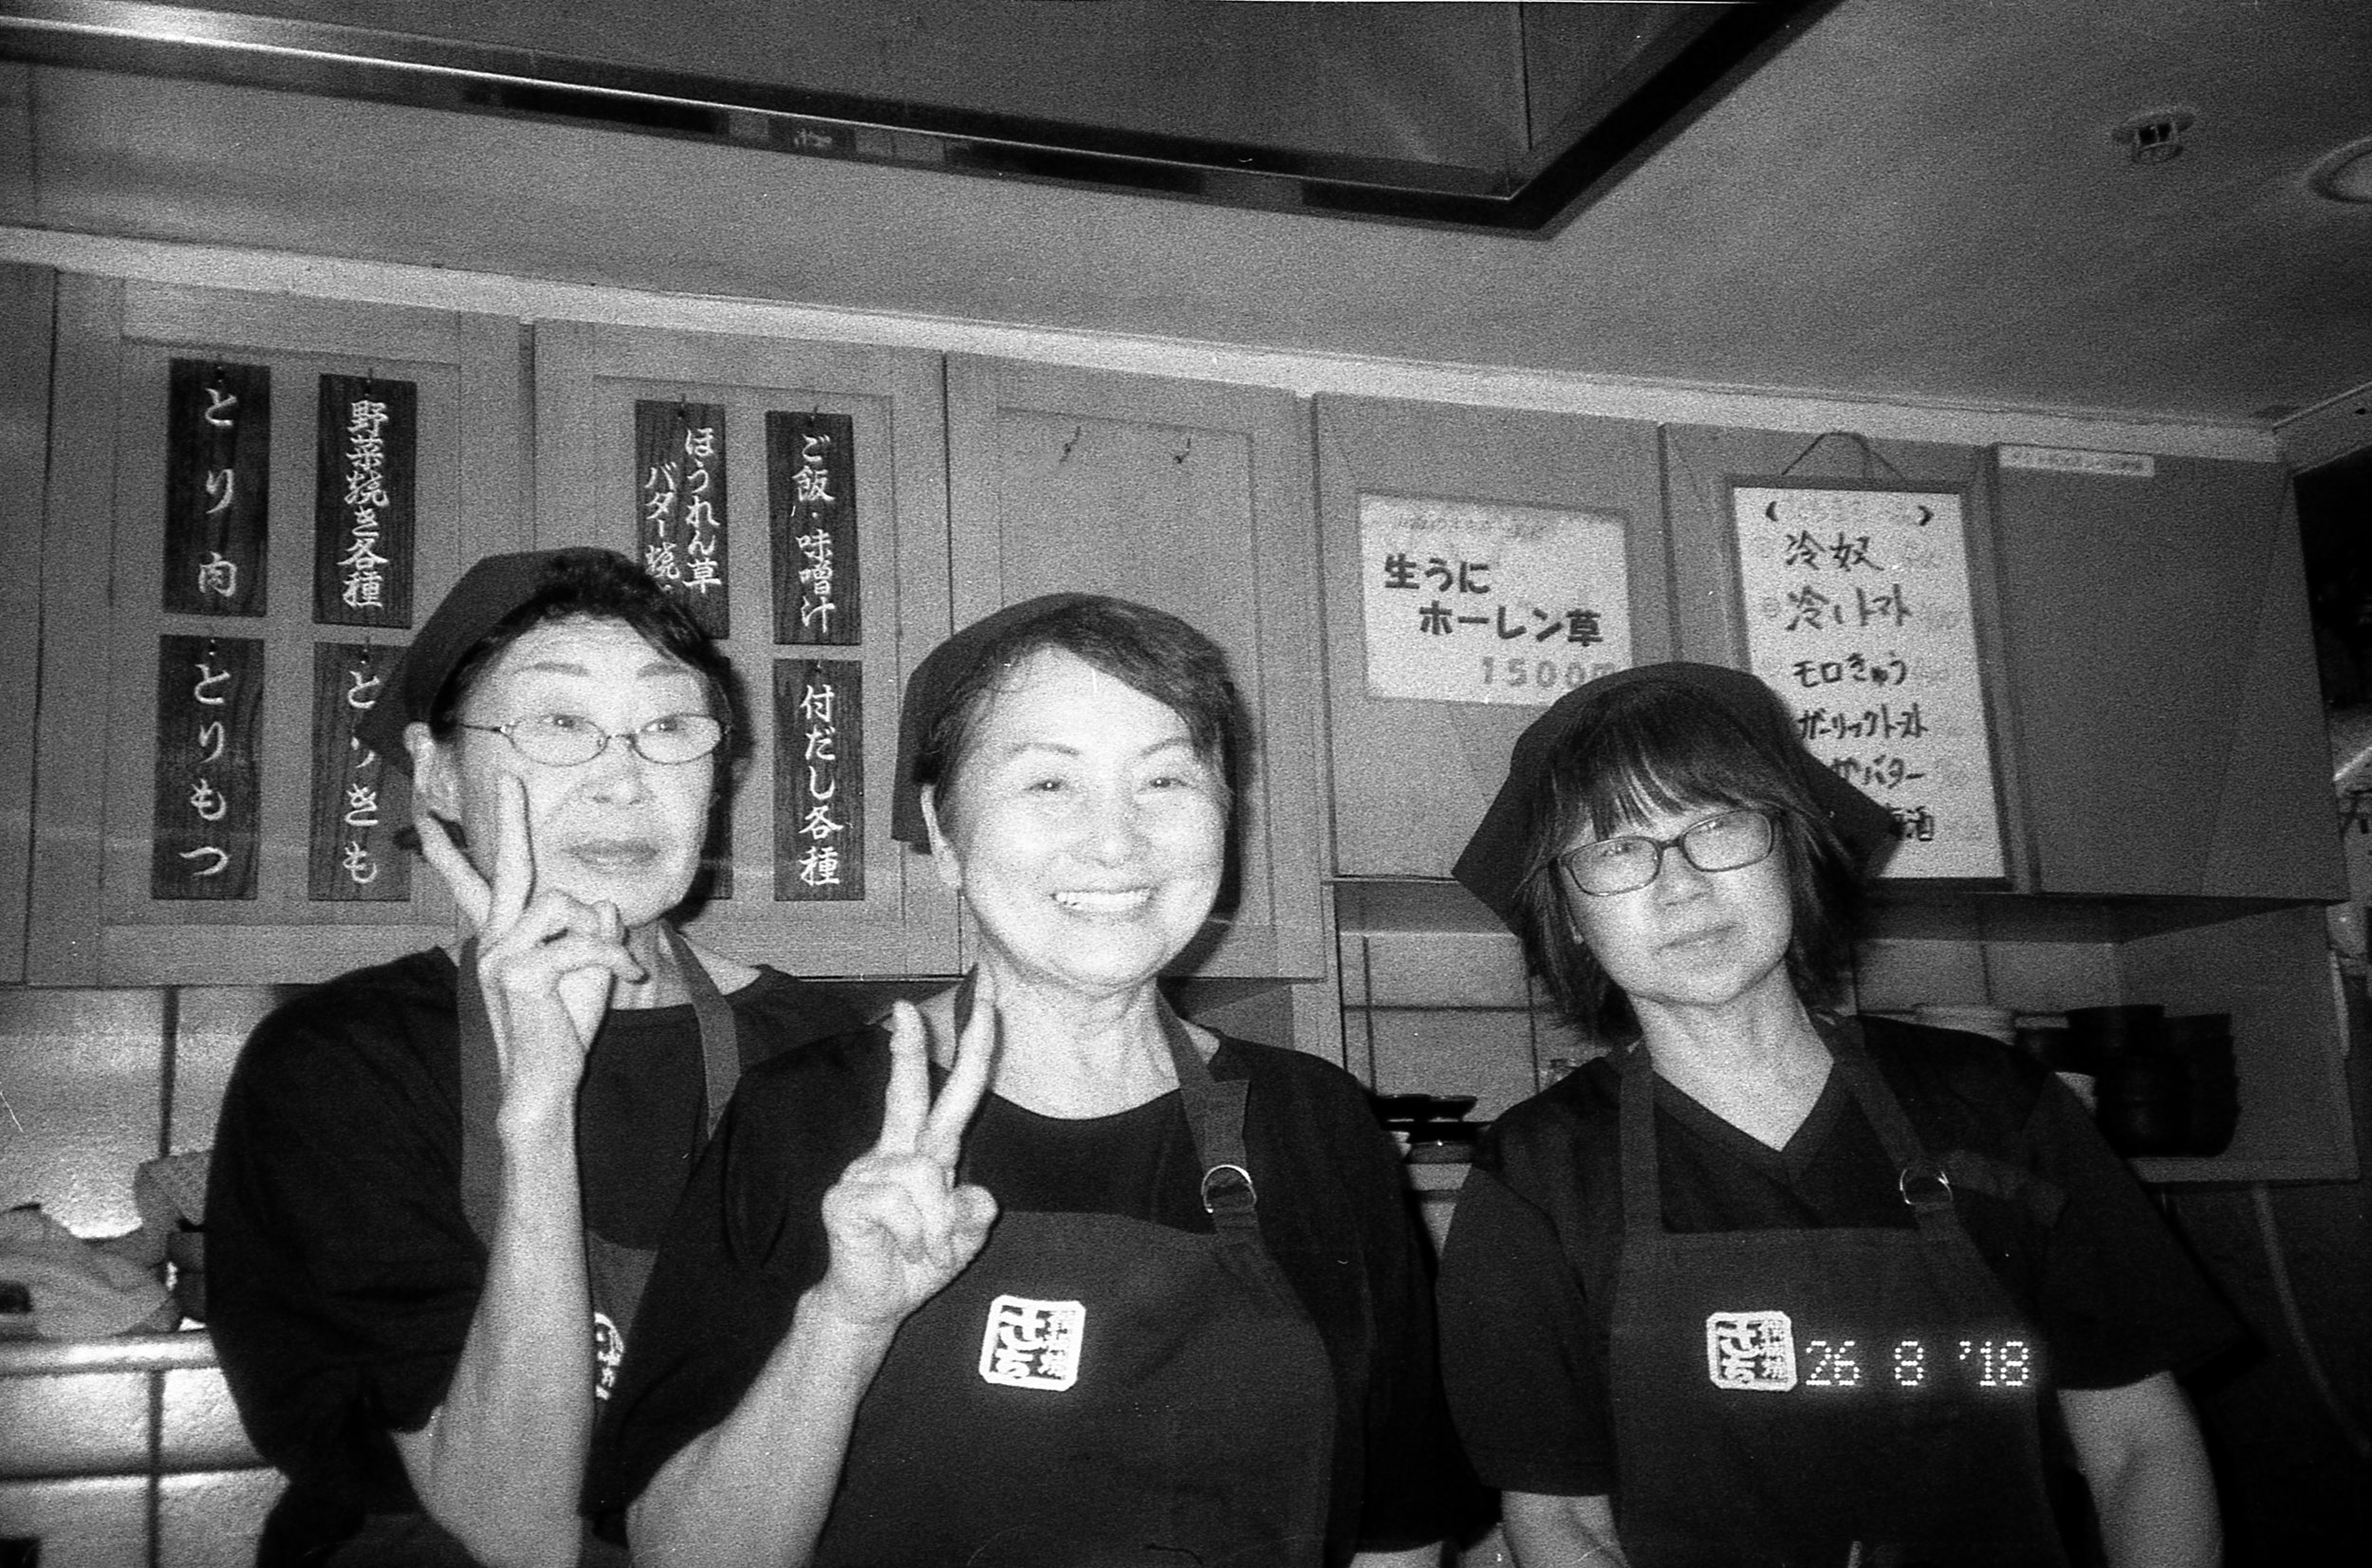 20180829_30_Hiro_Tkyo_003.jpg